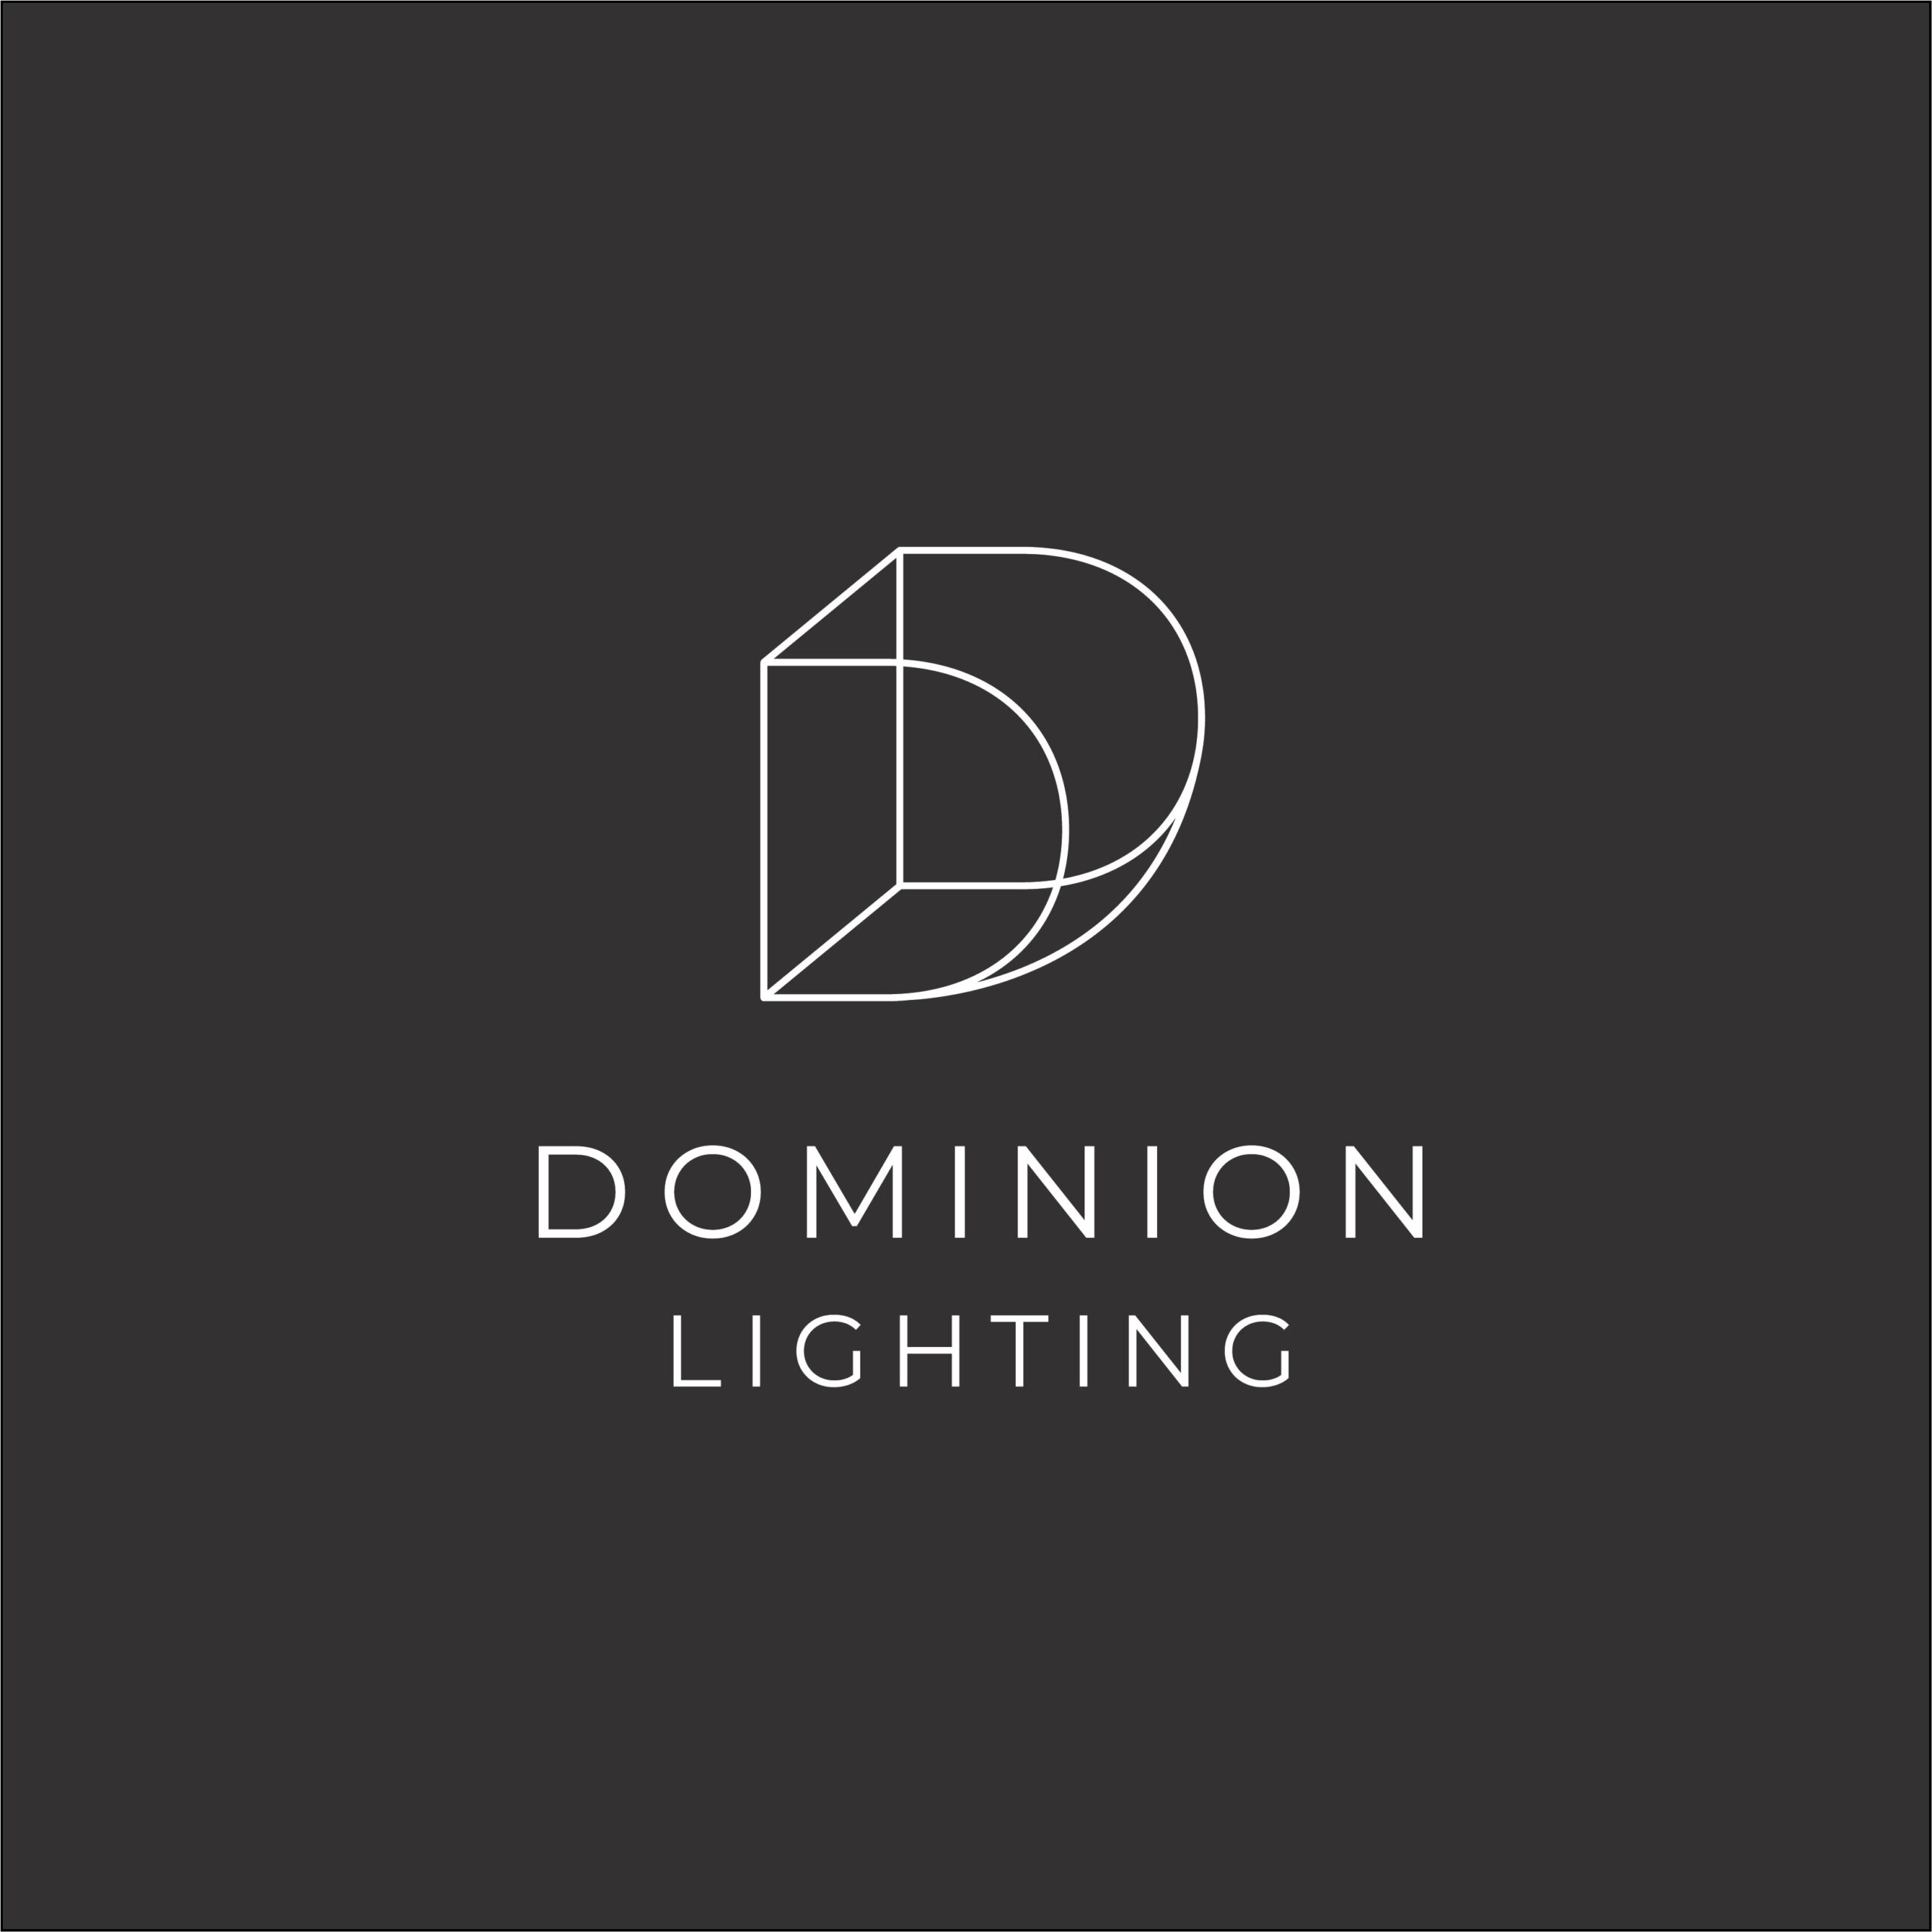 Dominion Lighting